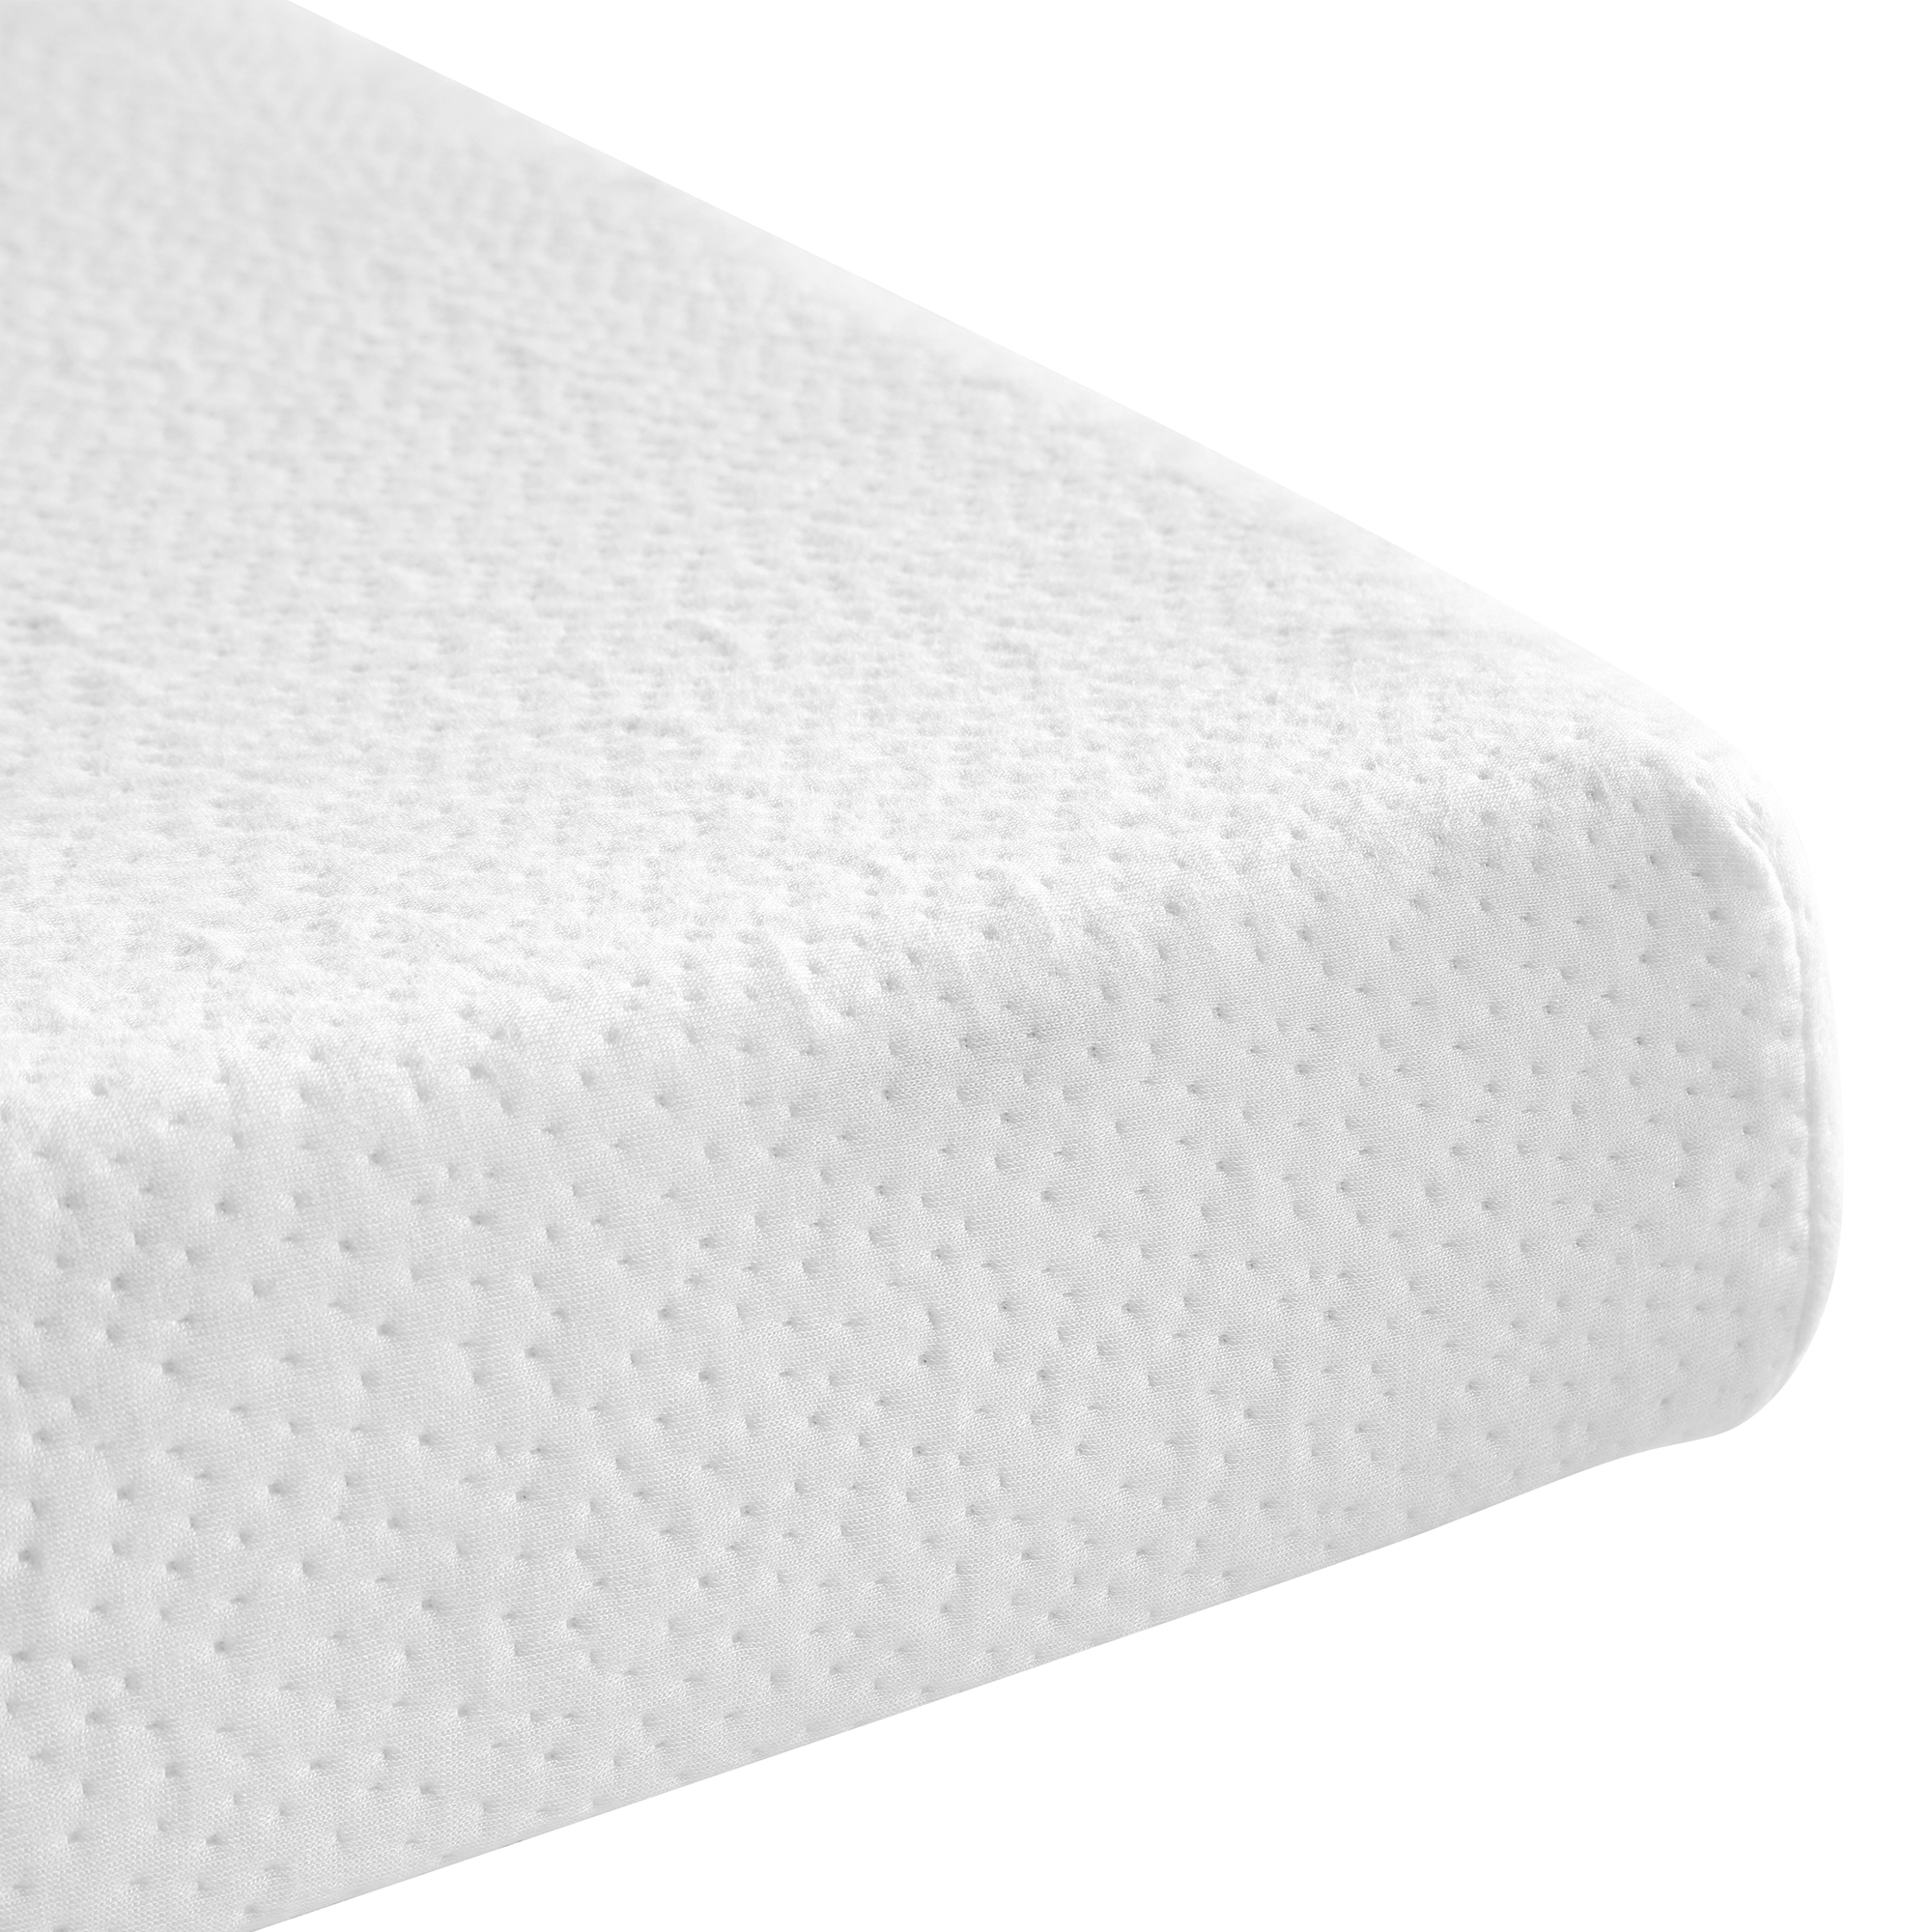 Fantastic Modern Sleep Memory Foam Replacement Sofa Bed 4 5 Inch Inzonedesignstudio Interior Chair Design Inzonedesignstudiocom